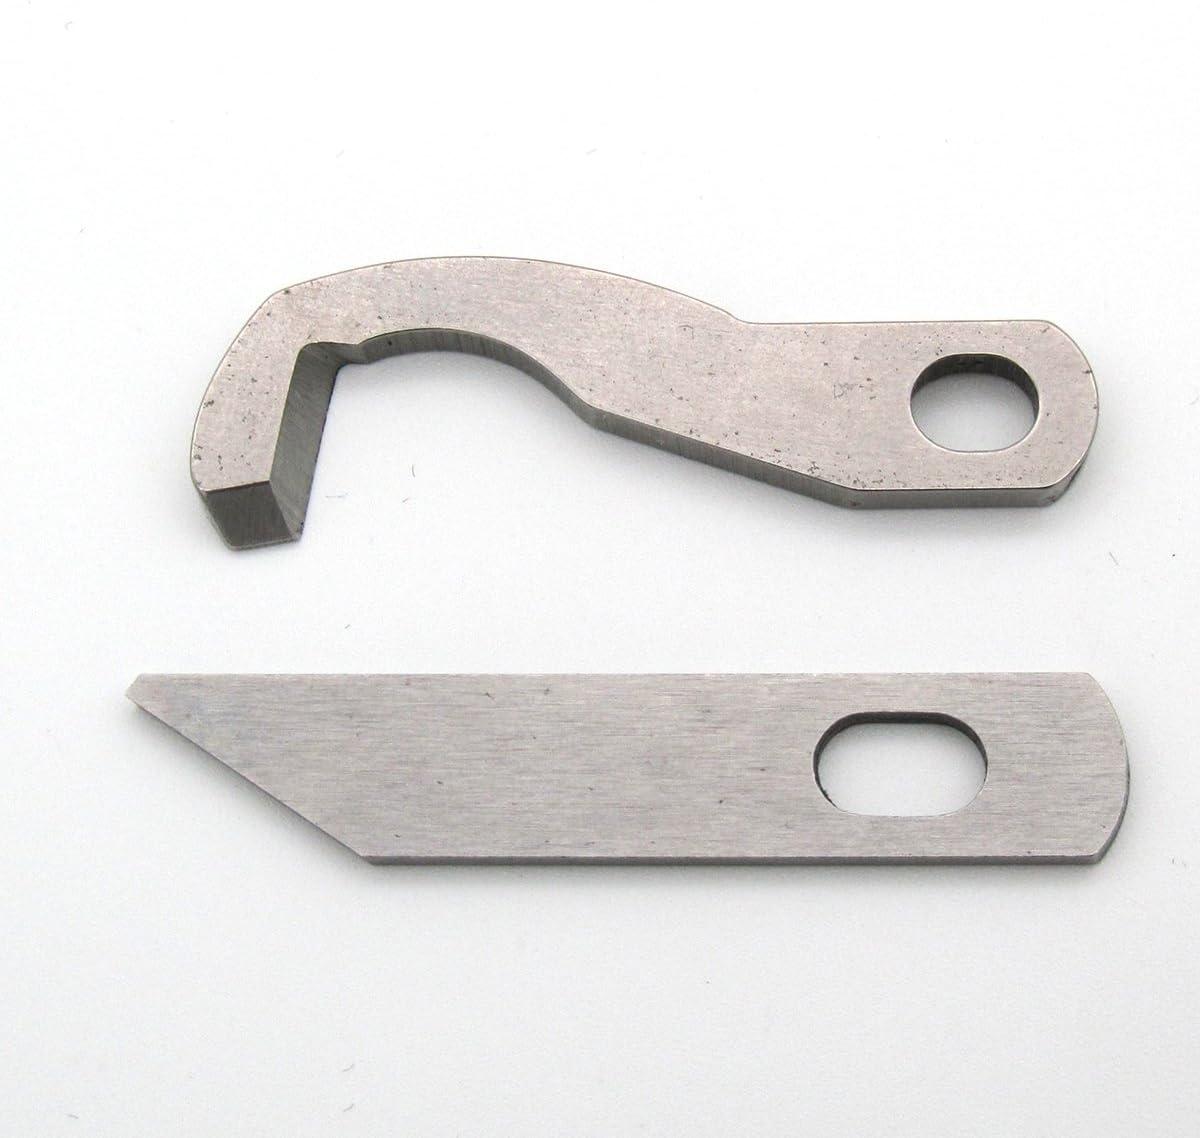 CKPSMS Marca -1SET #XB0563001+X77683001 Cuchillo Serger superior e inferior Ajuste para Brother 925D, 929D, 1034D Viking (cuchilla superior e inferior-XB0563001 + X77683001)